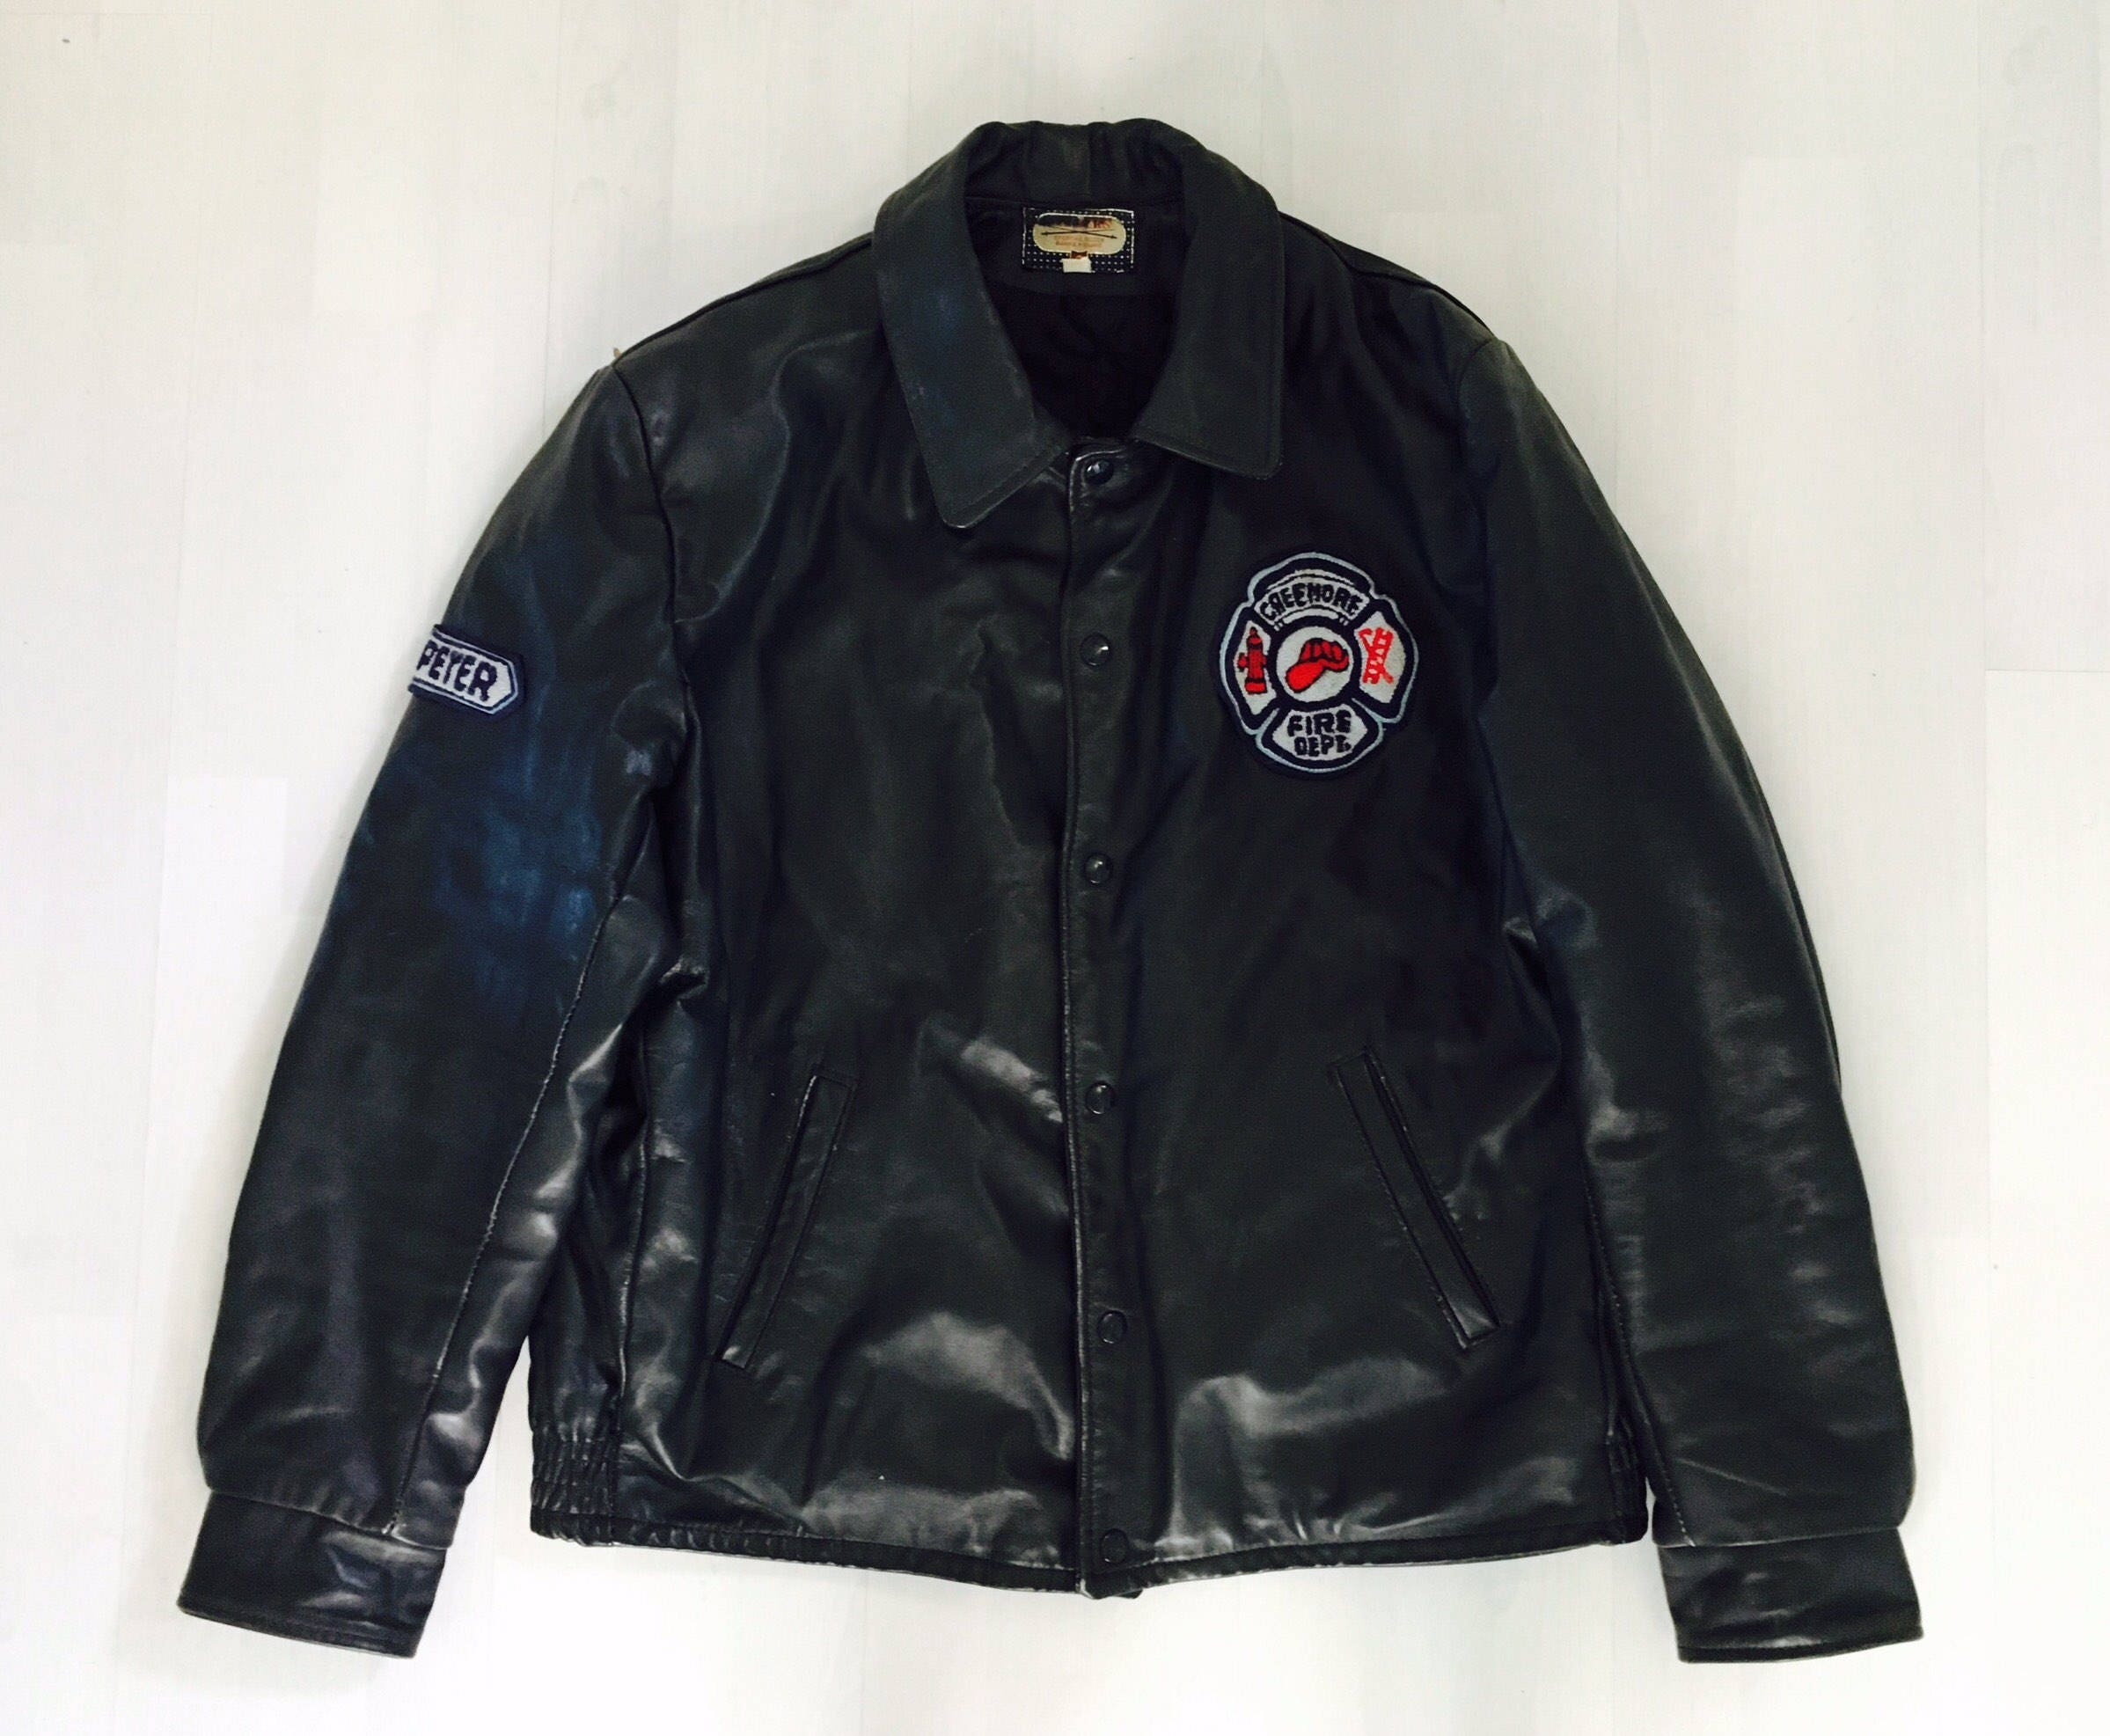 VINTAGE Leather Fire Department Jacket Creemore Fire Department Dark Navy Leather Jacket